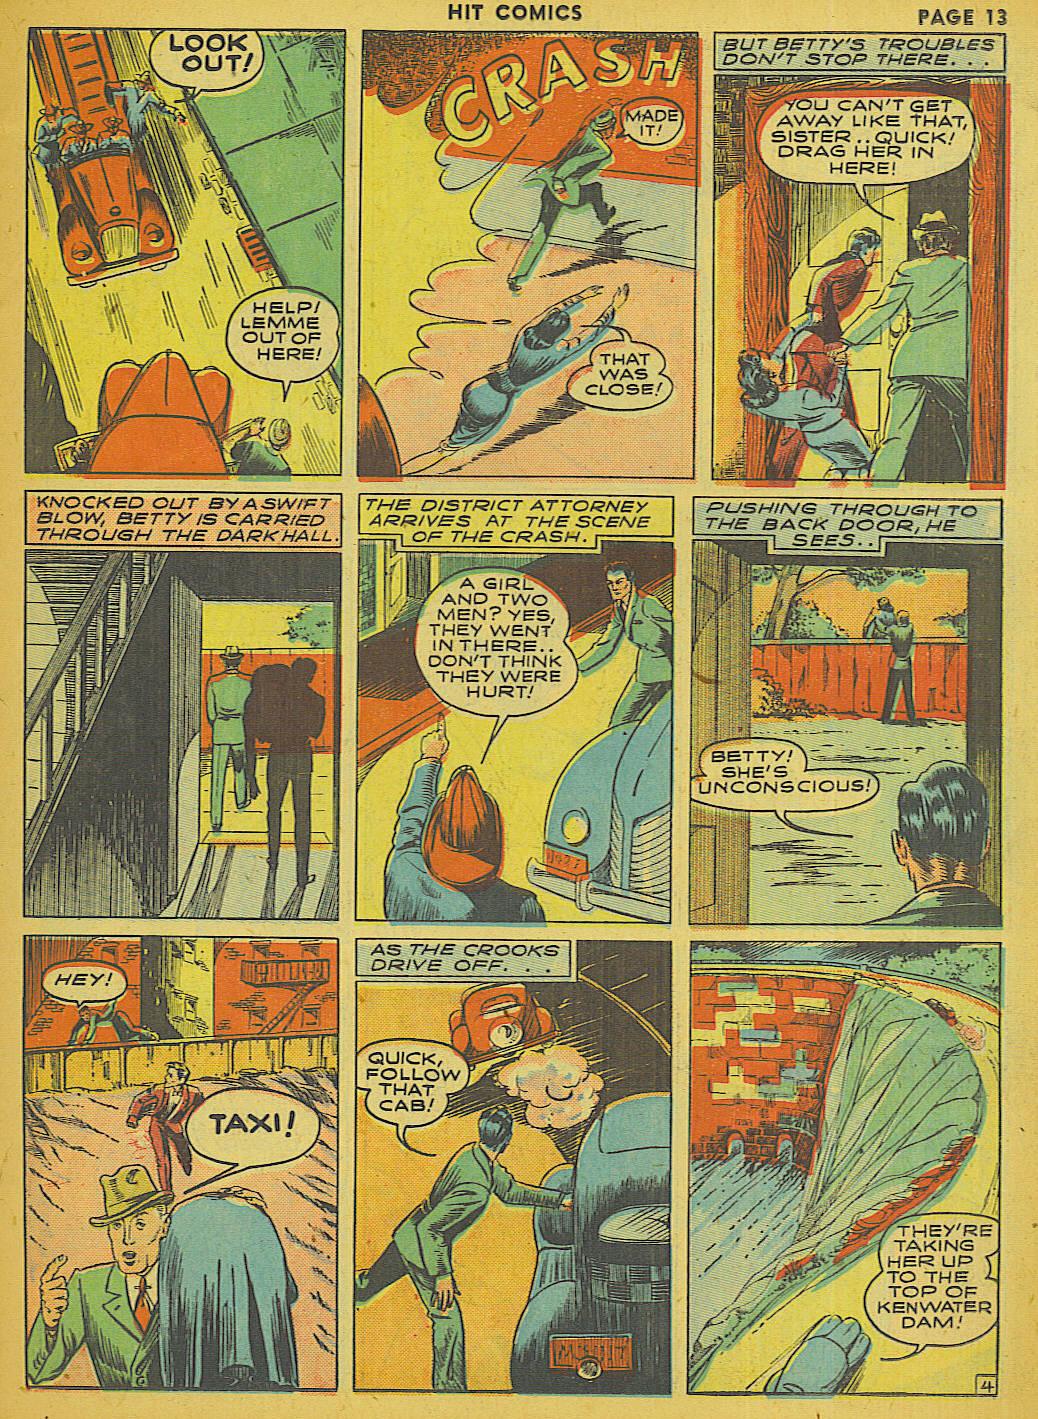 Read online Hit Comics comic -  Issue #13 - 15